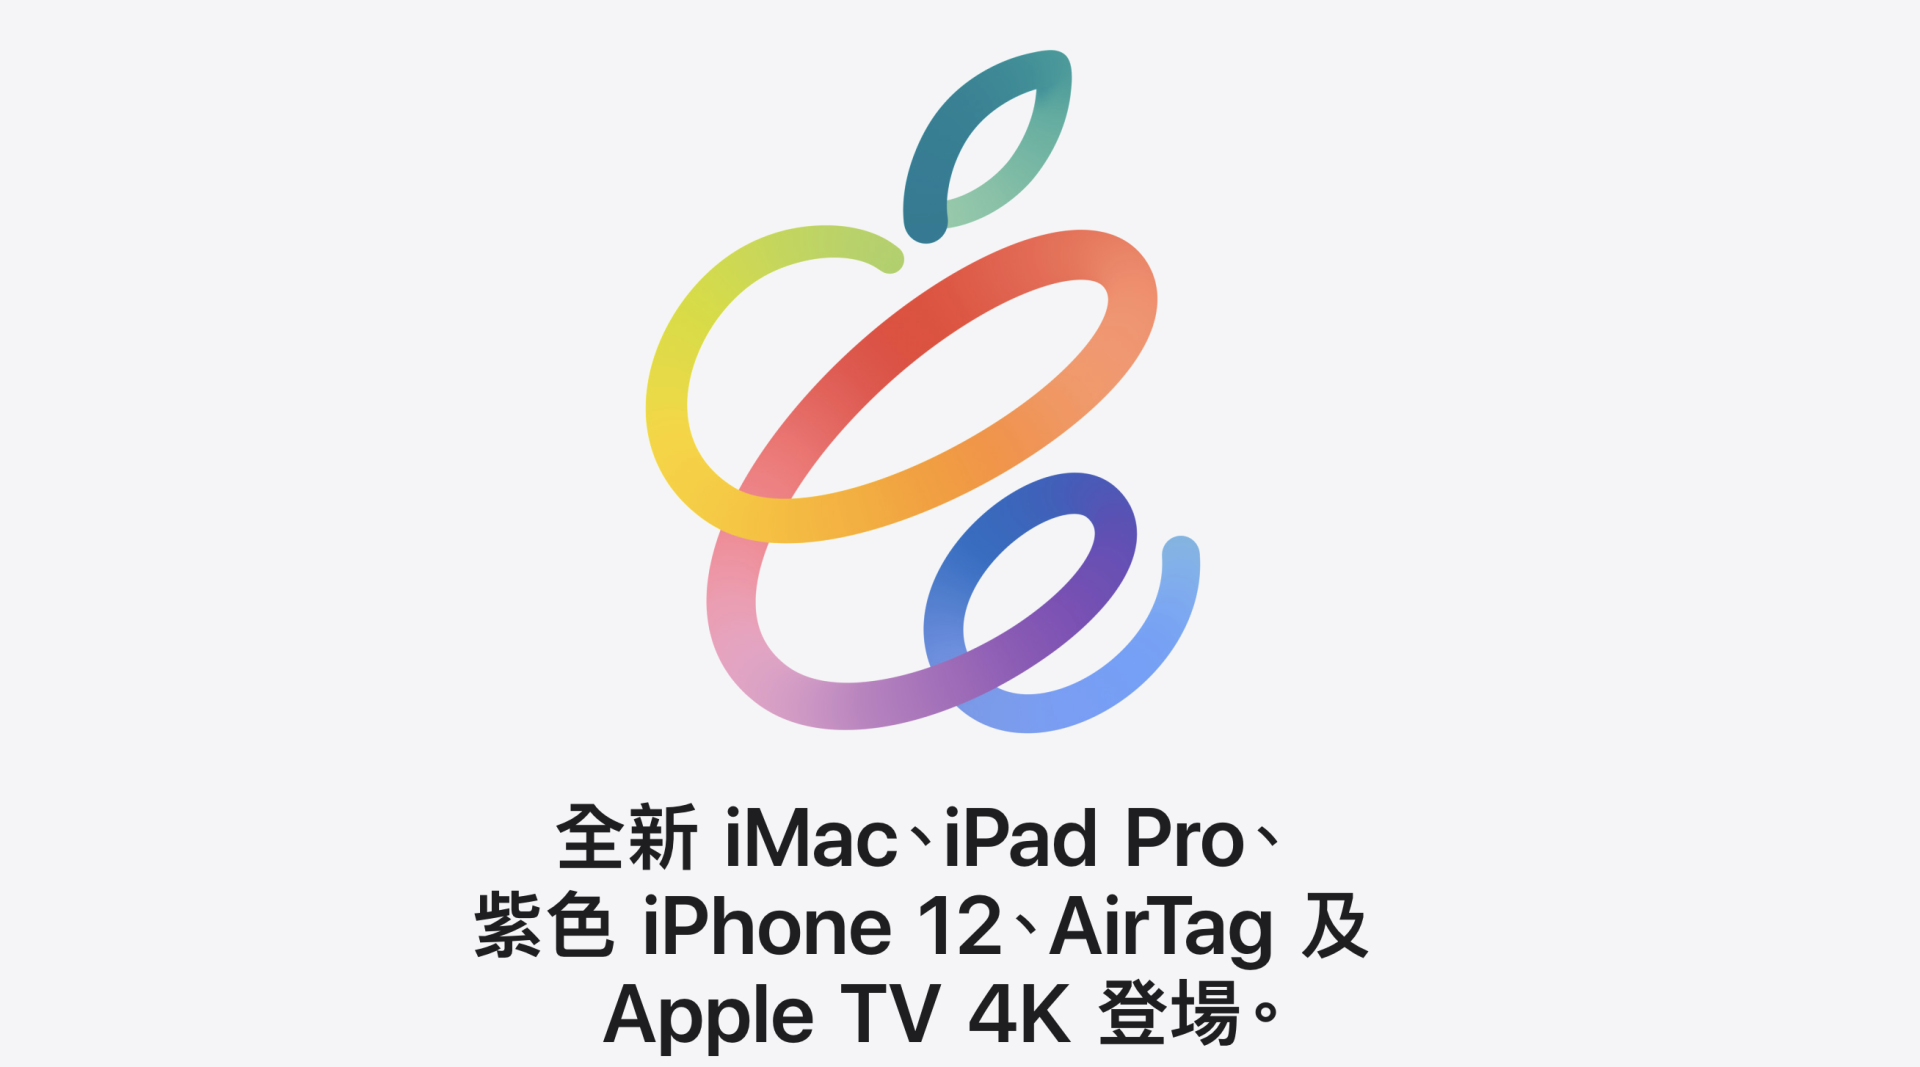 踏春而来:全新 iMac、iPad Pro、紫色 iPhone 12、AirTag 和 Apple TV 4K